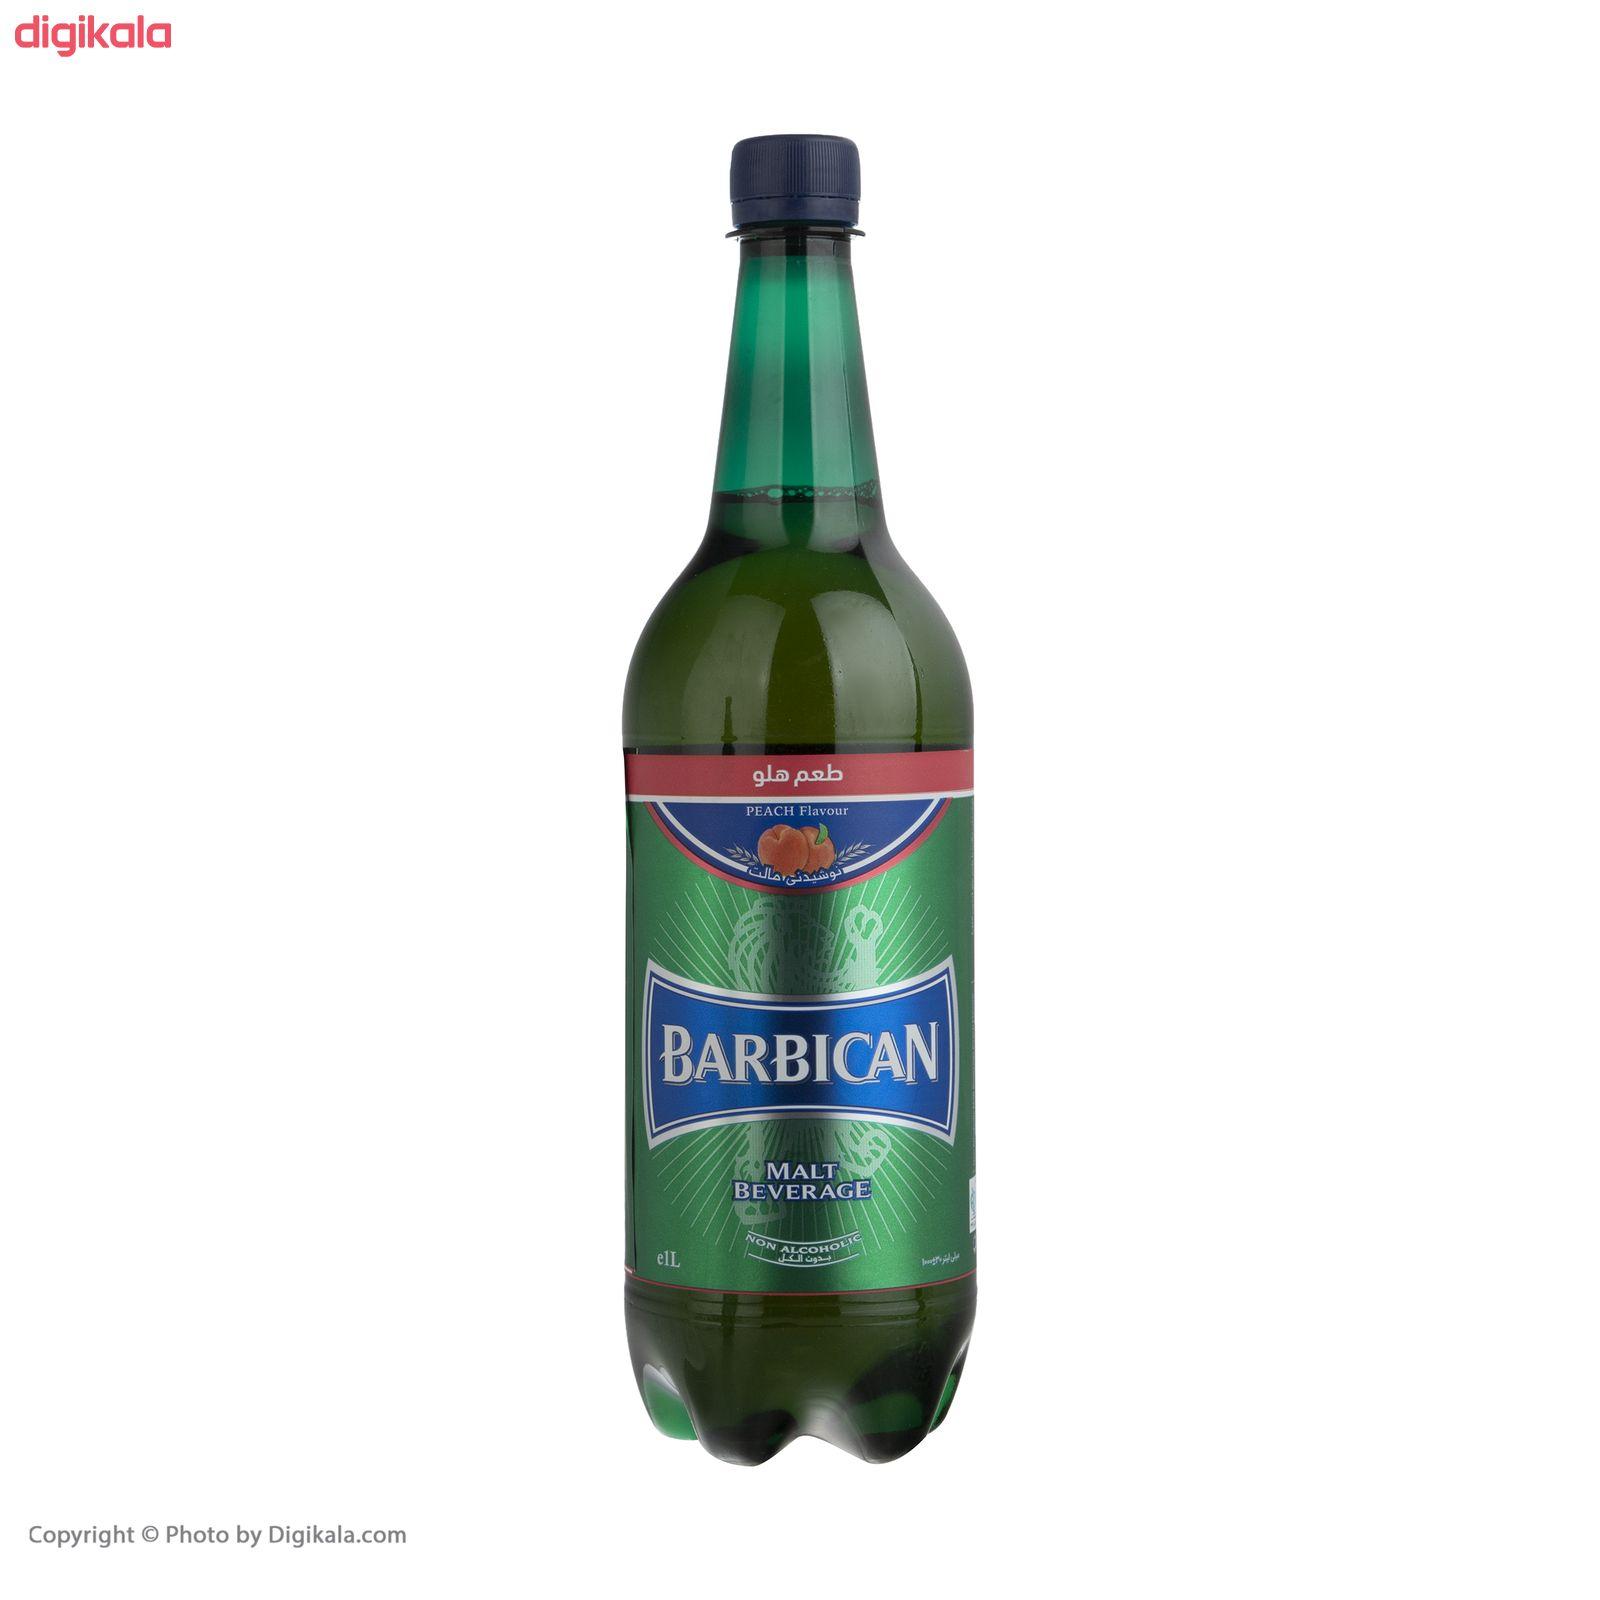 نوشیدنی مالت باربیکن طعم هلو - 1 لیتر main 1 1